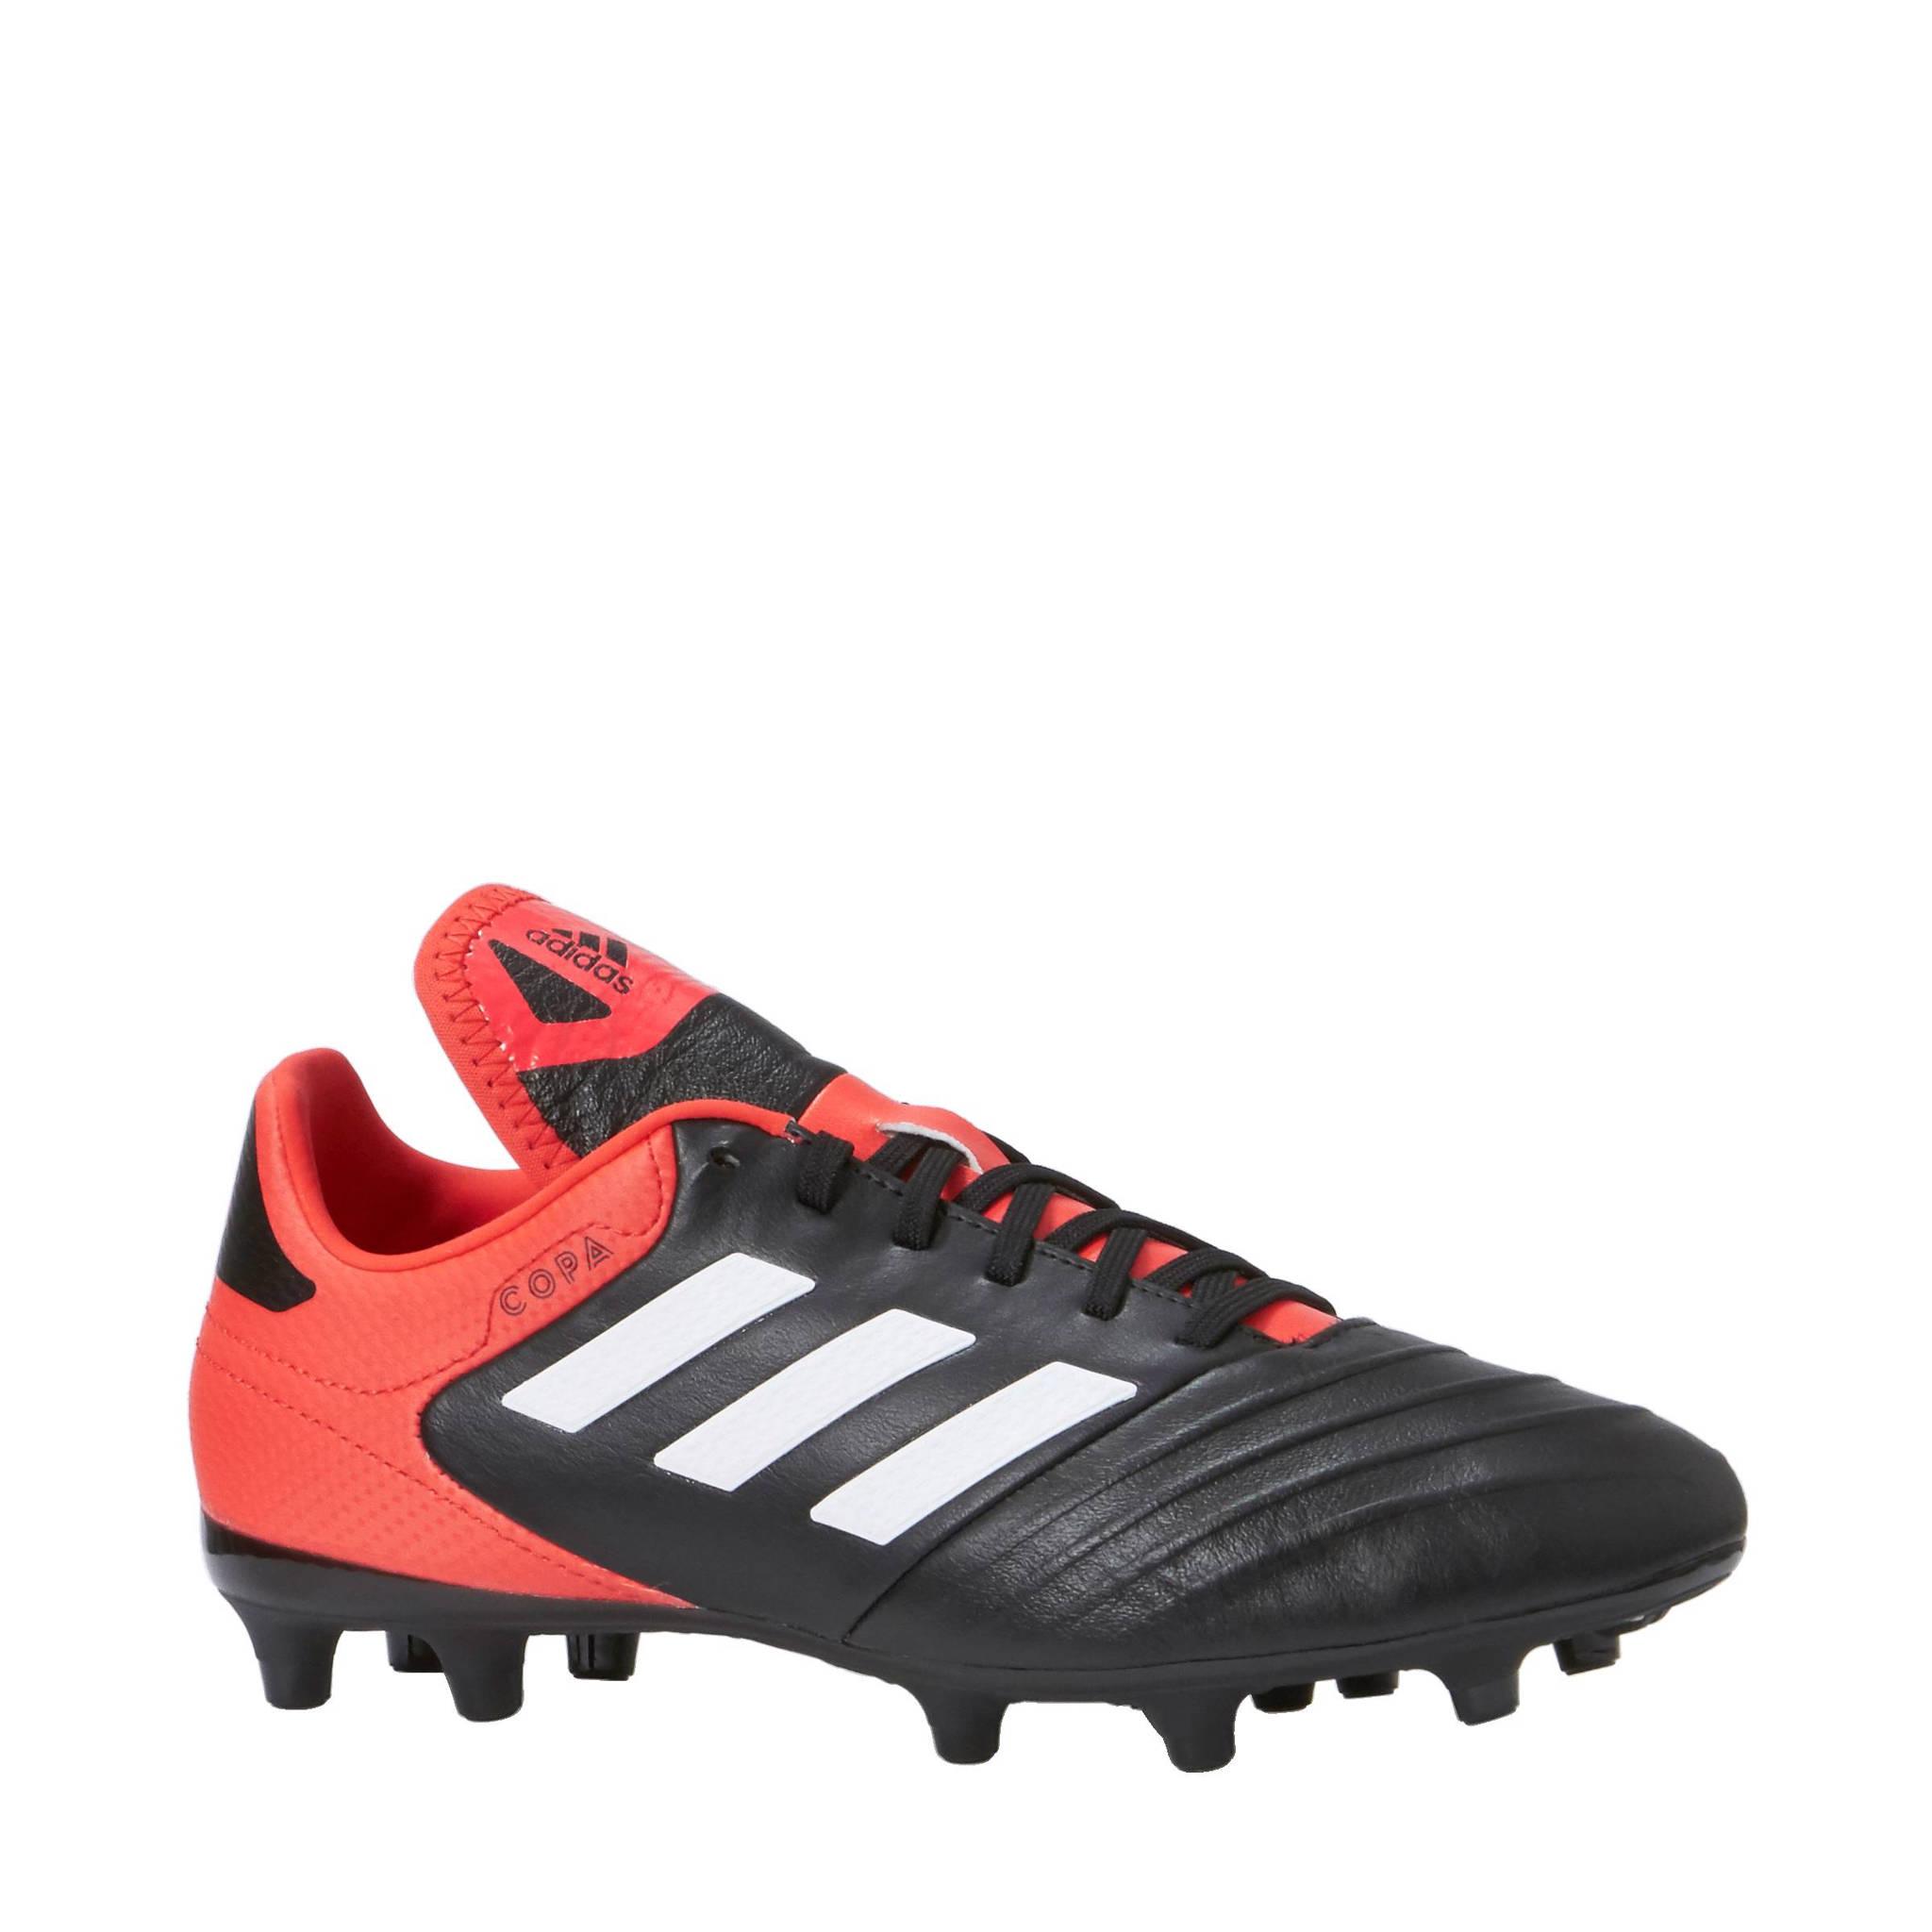 the best attitude 4a181 d5761 adidas performance Copa 18.3 FG voetbalschoenen  wehkamp